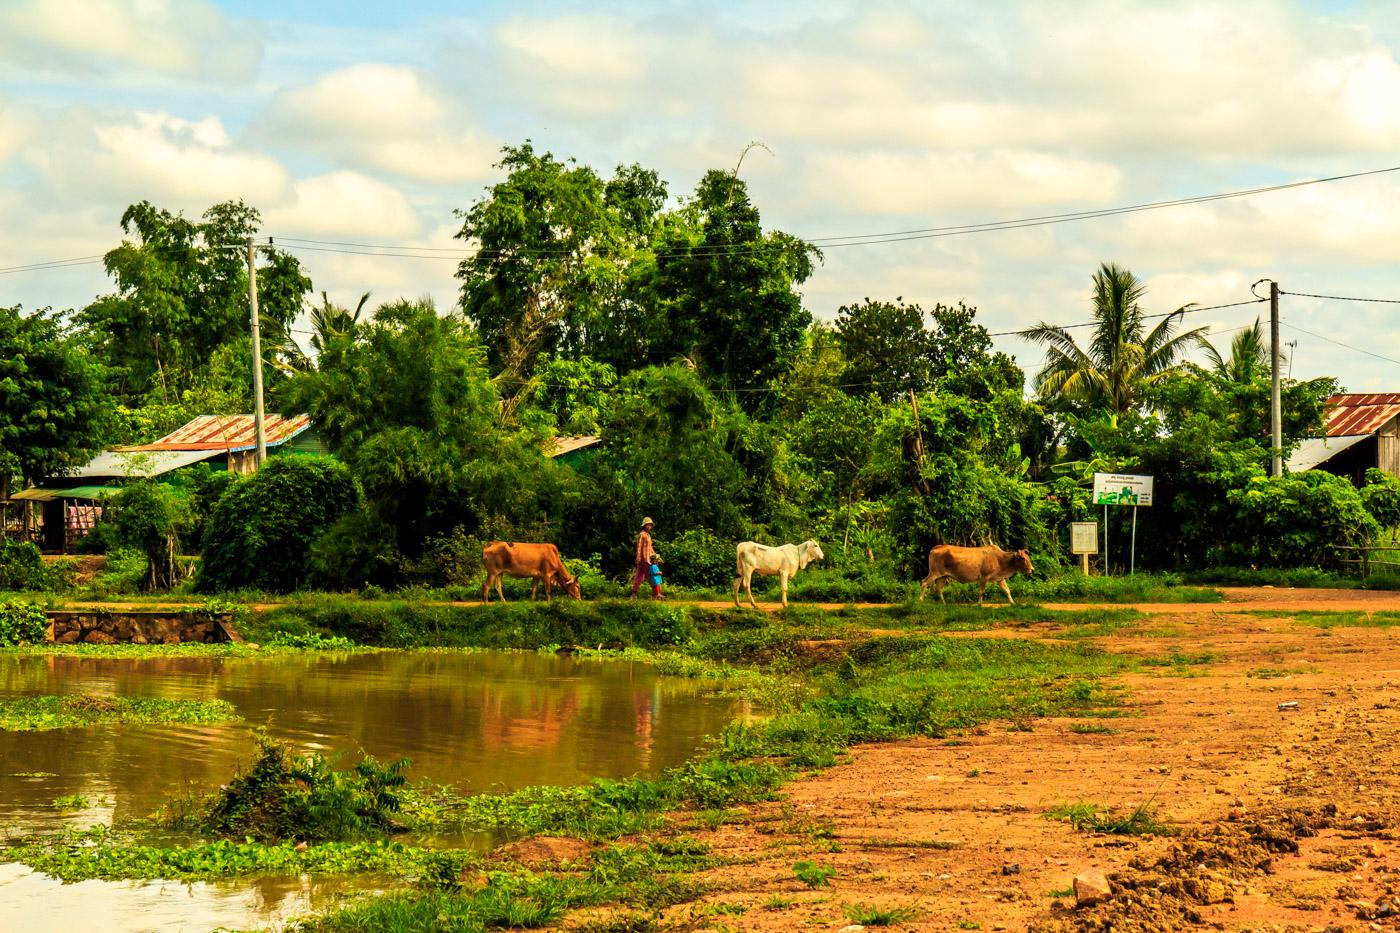 Village traffic.